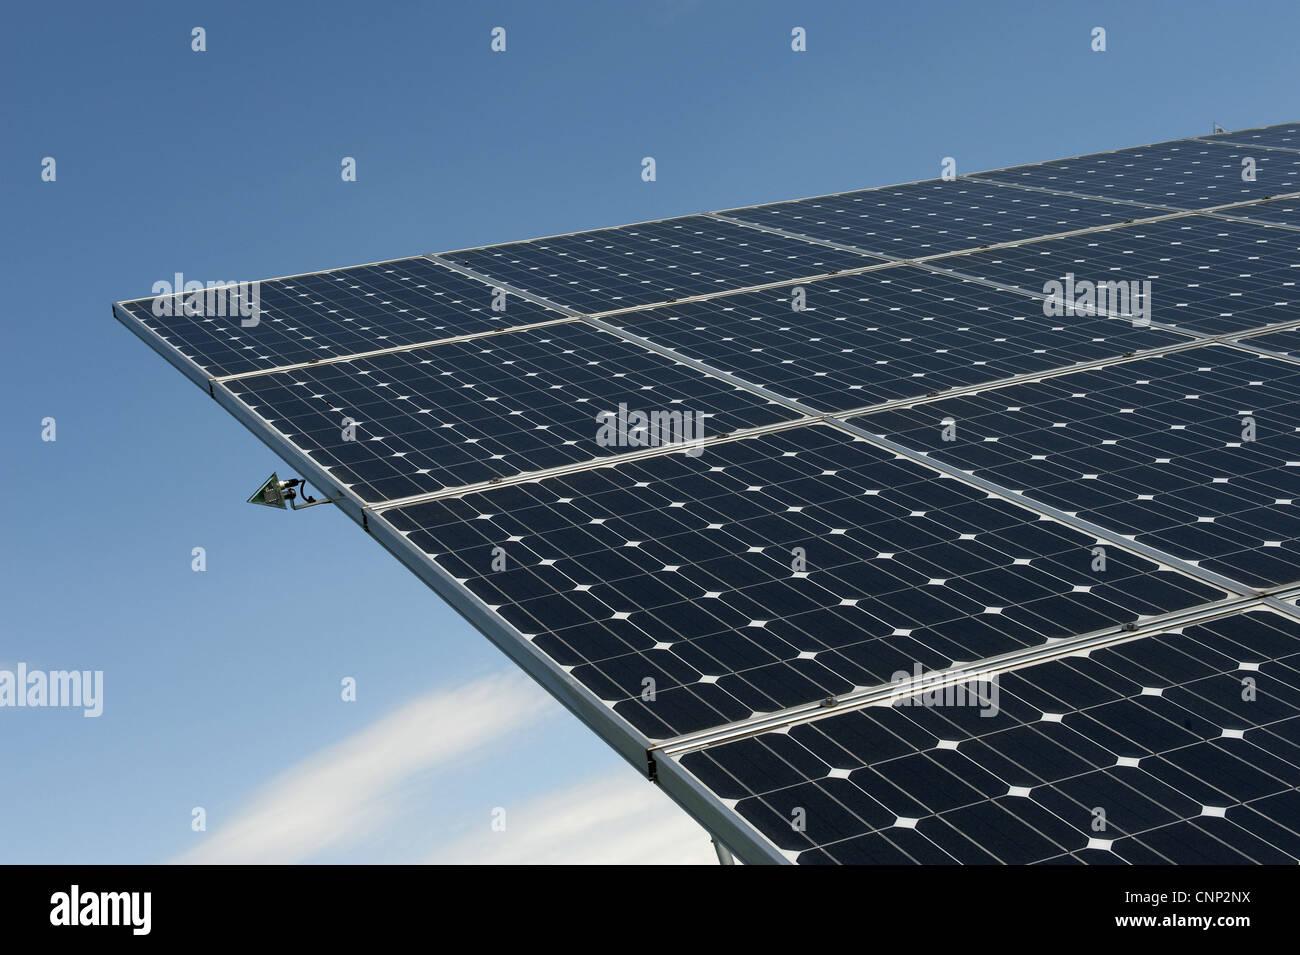 Solar energy panels at ecotech centre, Swaffham, Norfolk, England, august - Stock Image